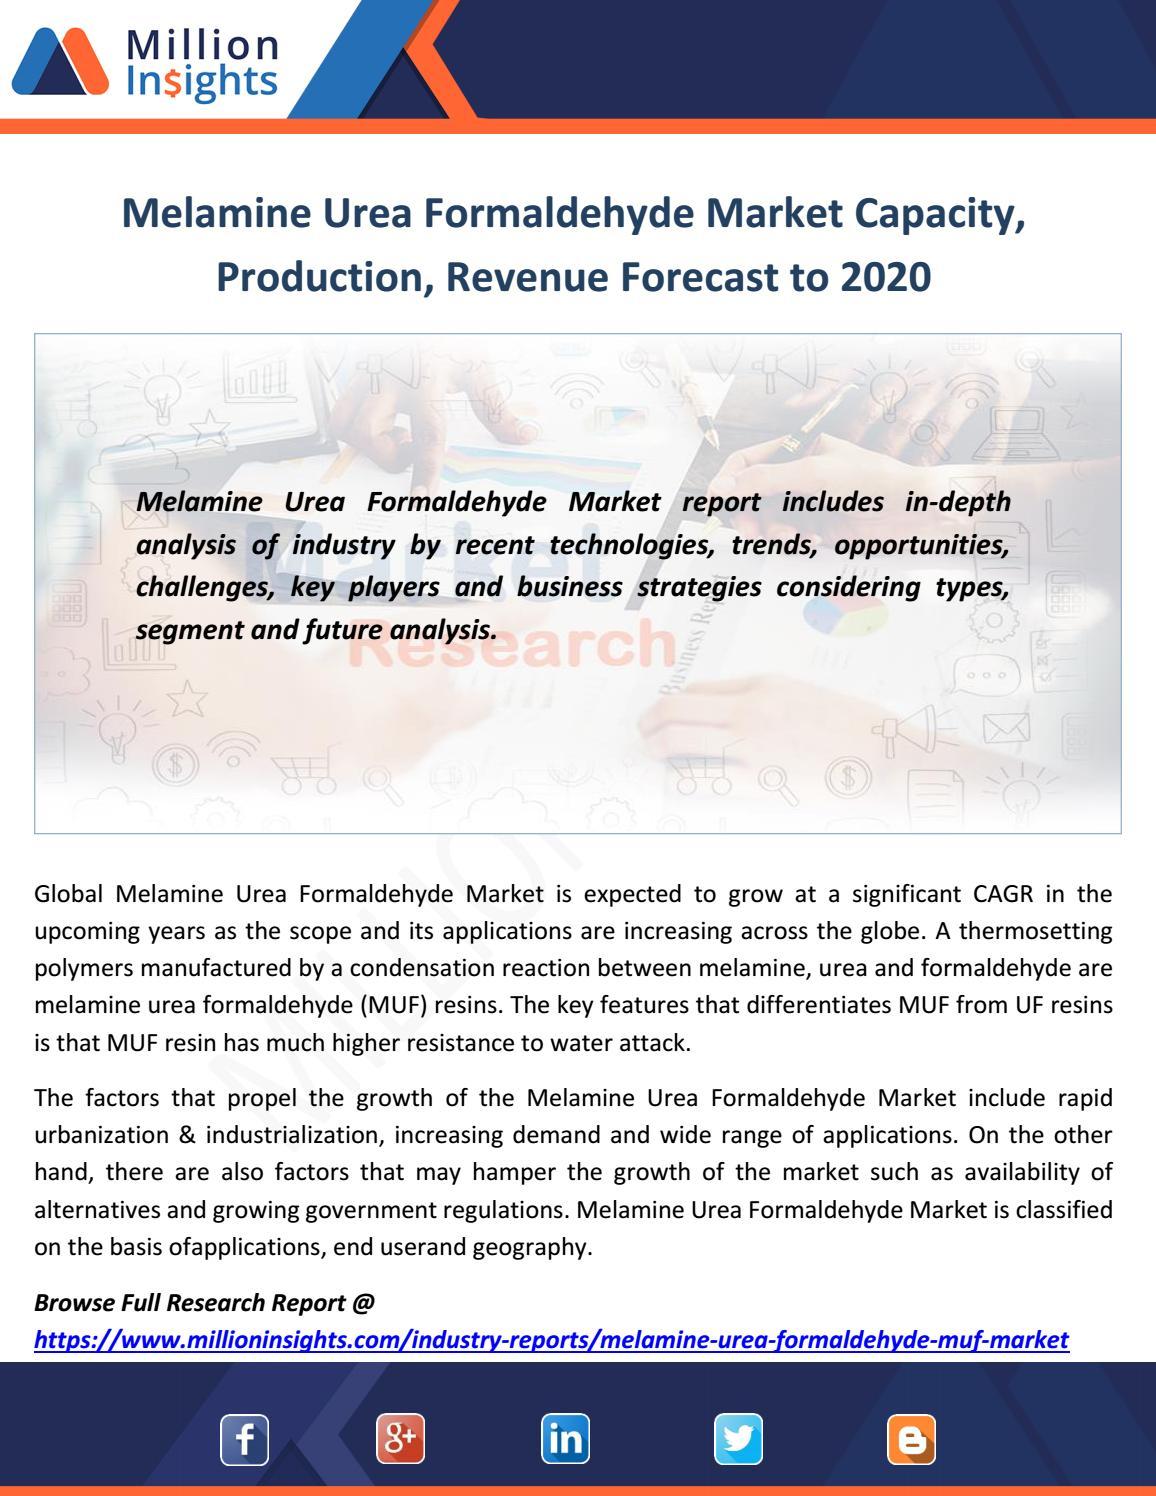 Melamine urea formaldehyde market capacity, production, revenue